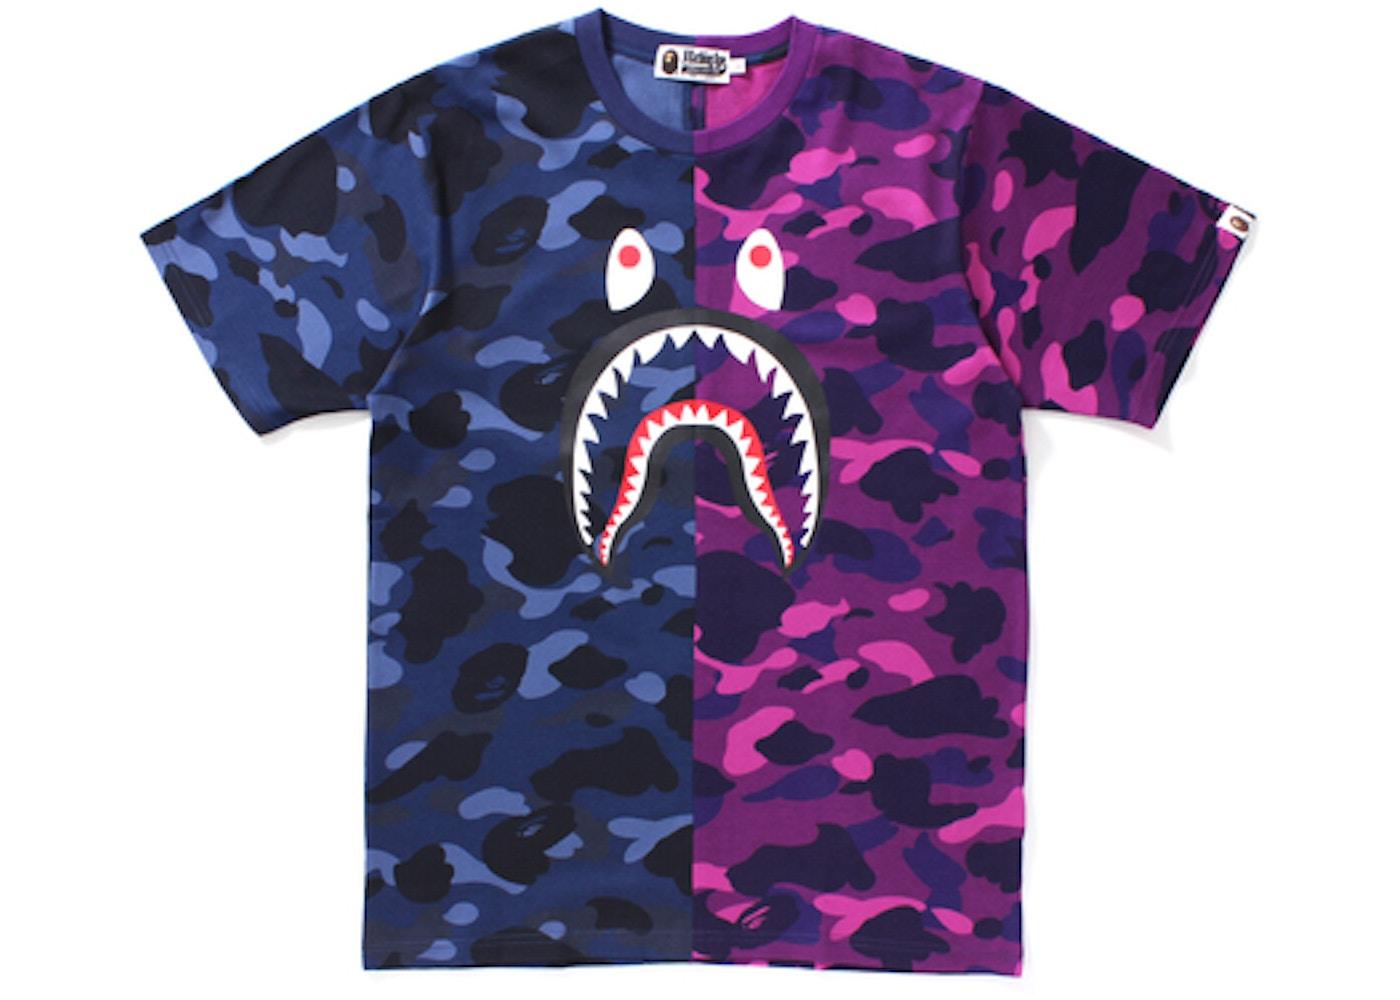 52984f97 BAPE Color Camo Shark Tee Navy/Purple Camo -